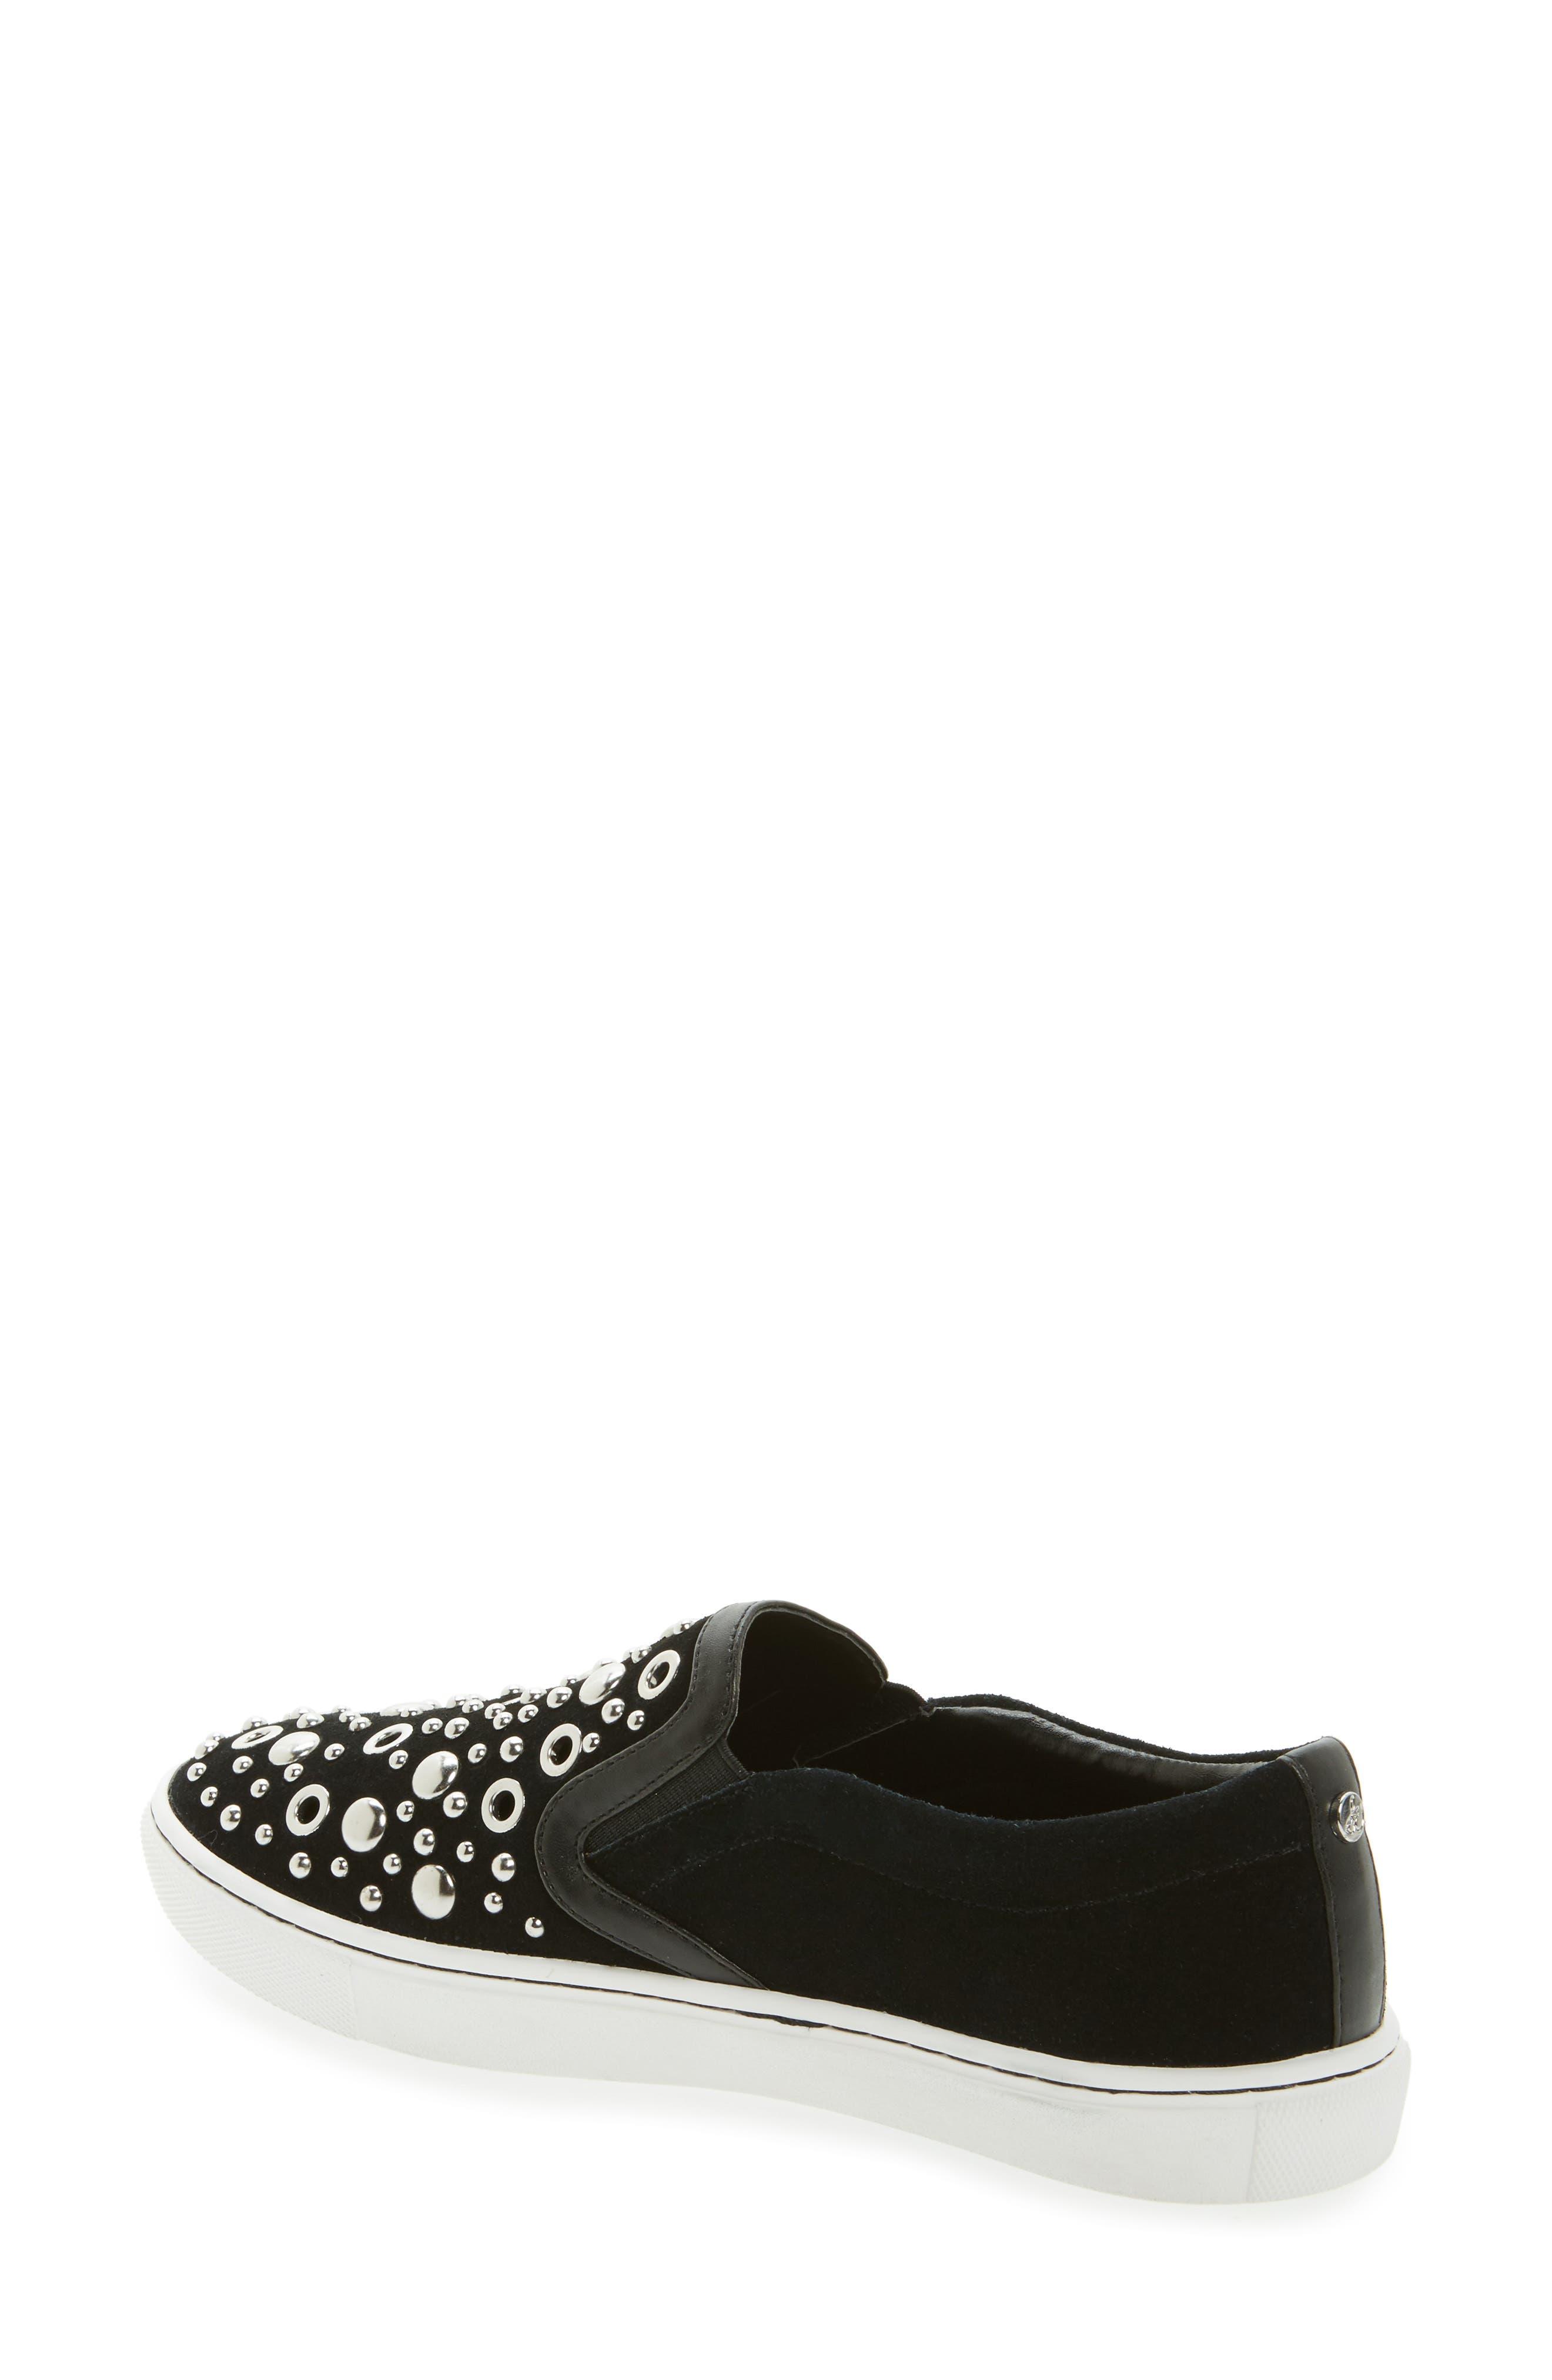 Paven Embellished Slip-On Sneaker,                             Alternate thumbnail 2, color,                             001